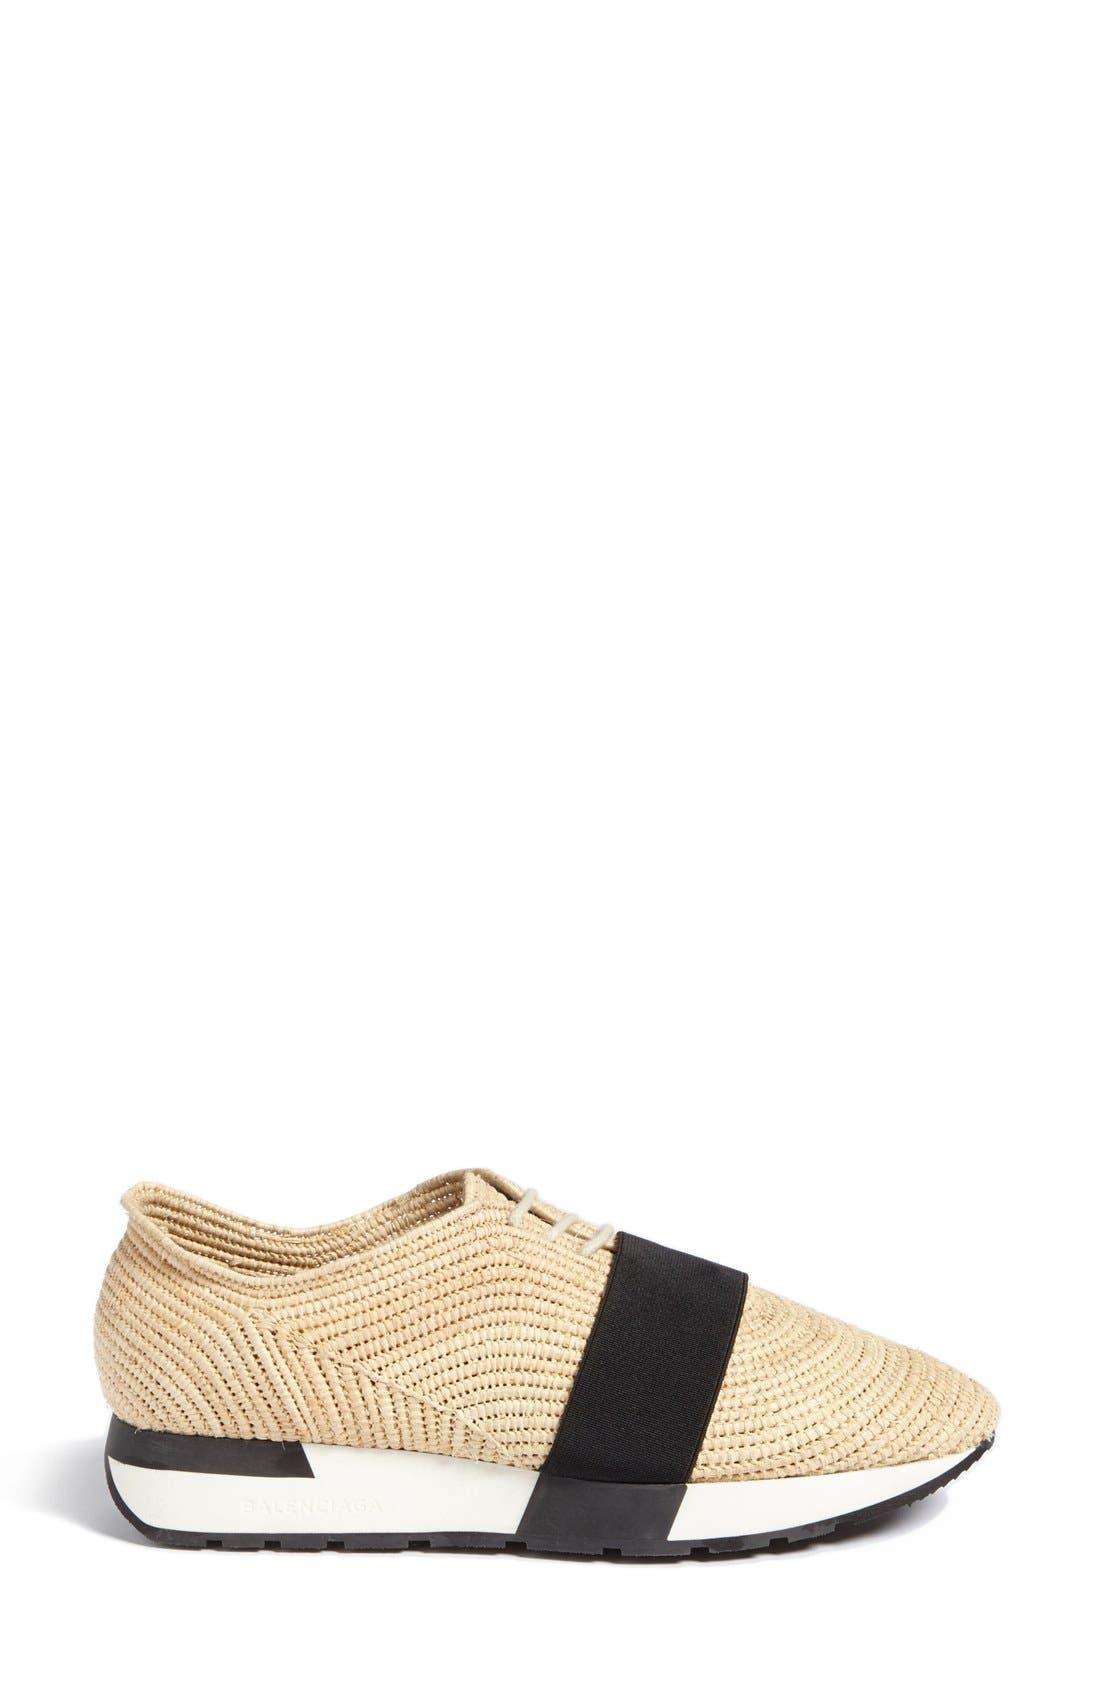 Alternate Image 2  - Balenciaga 'Runner' Raffia Sneaker (Women)